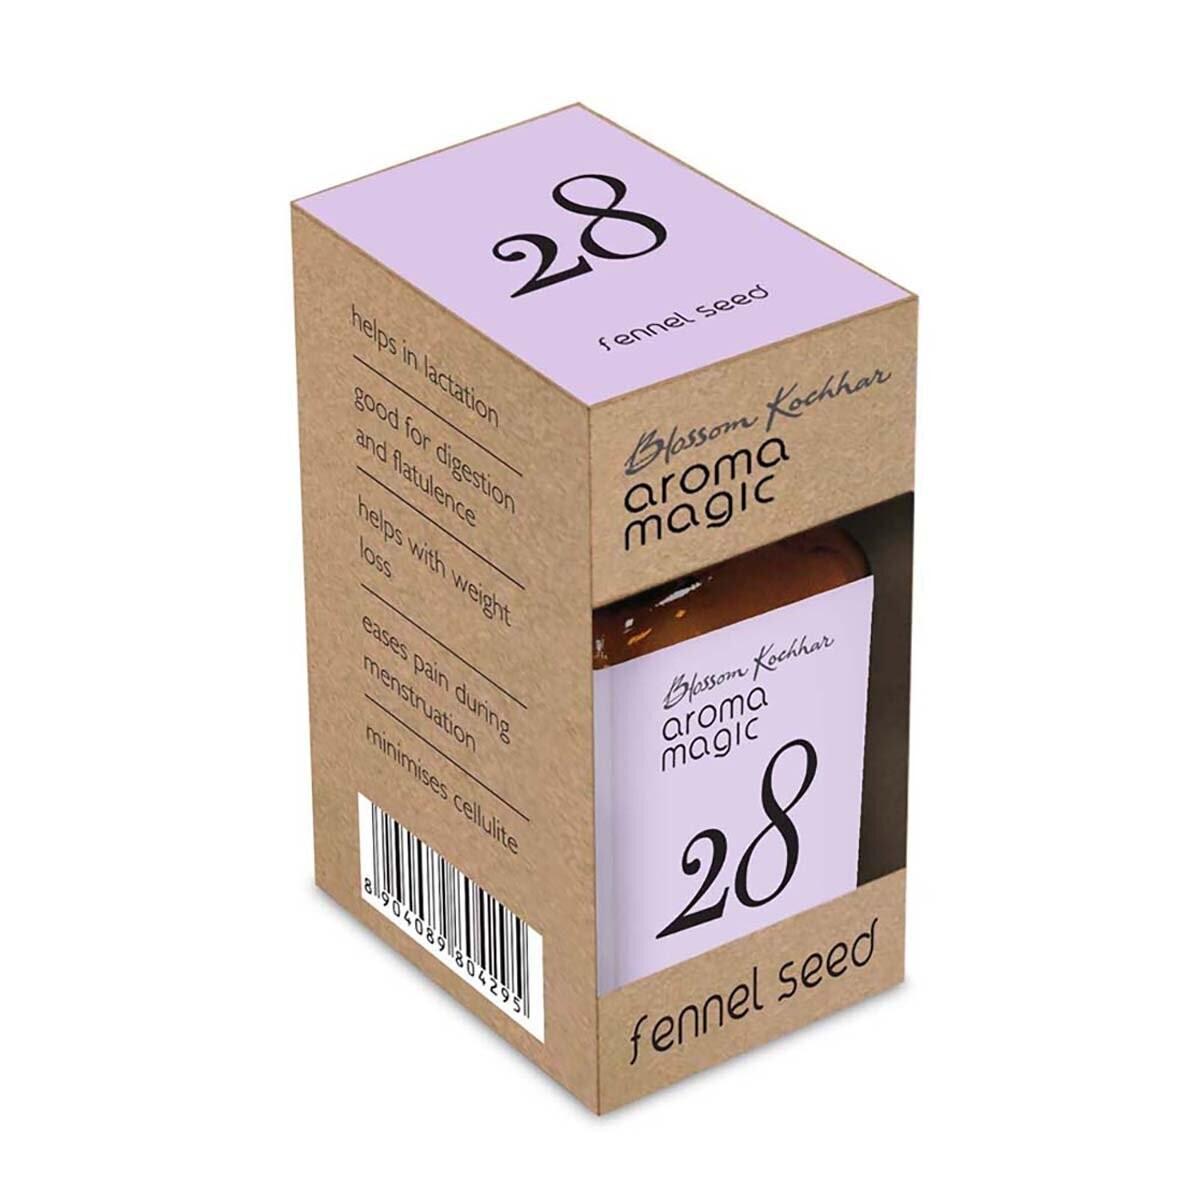 Aroma Magic 28 Fennel Seed Oil 20 Ml